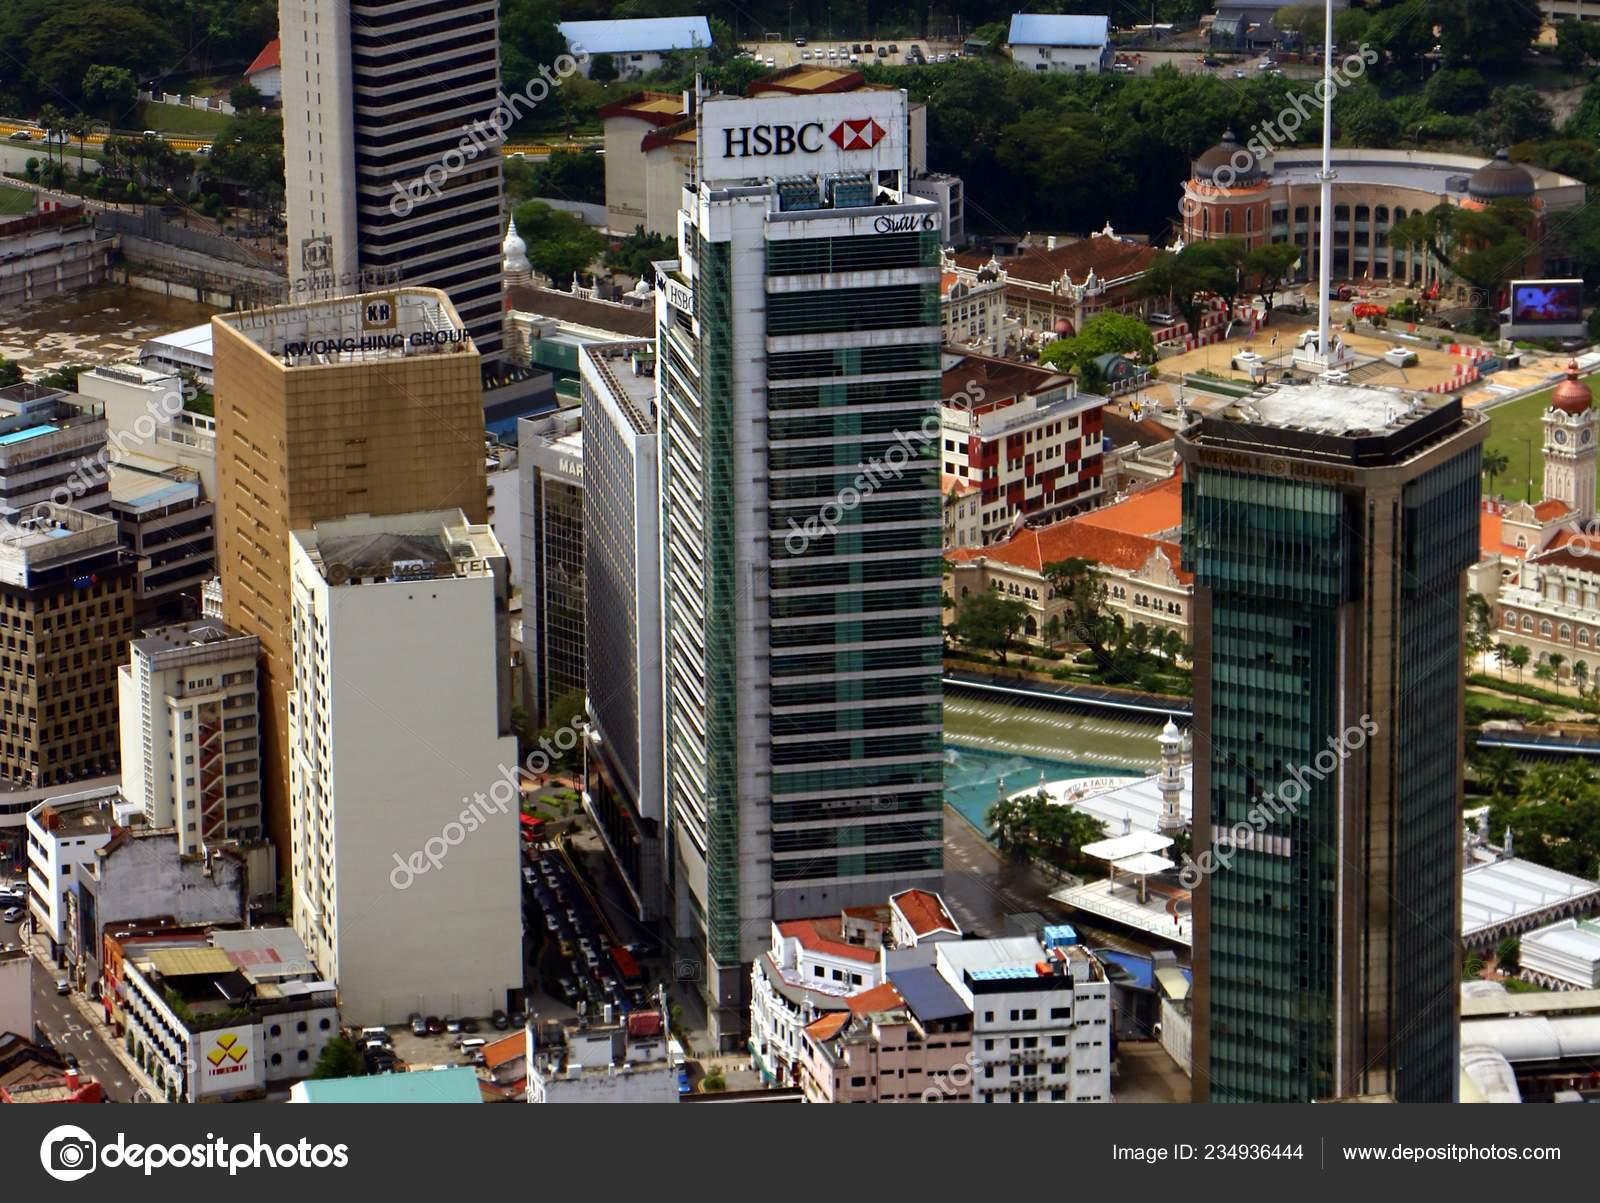 Kuala Lumpur Malaysia December 2018 Hsbc Bank Located Leboh Ampang